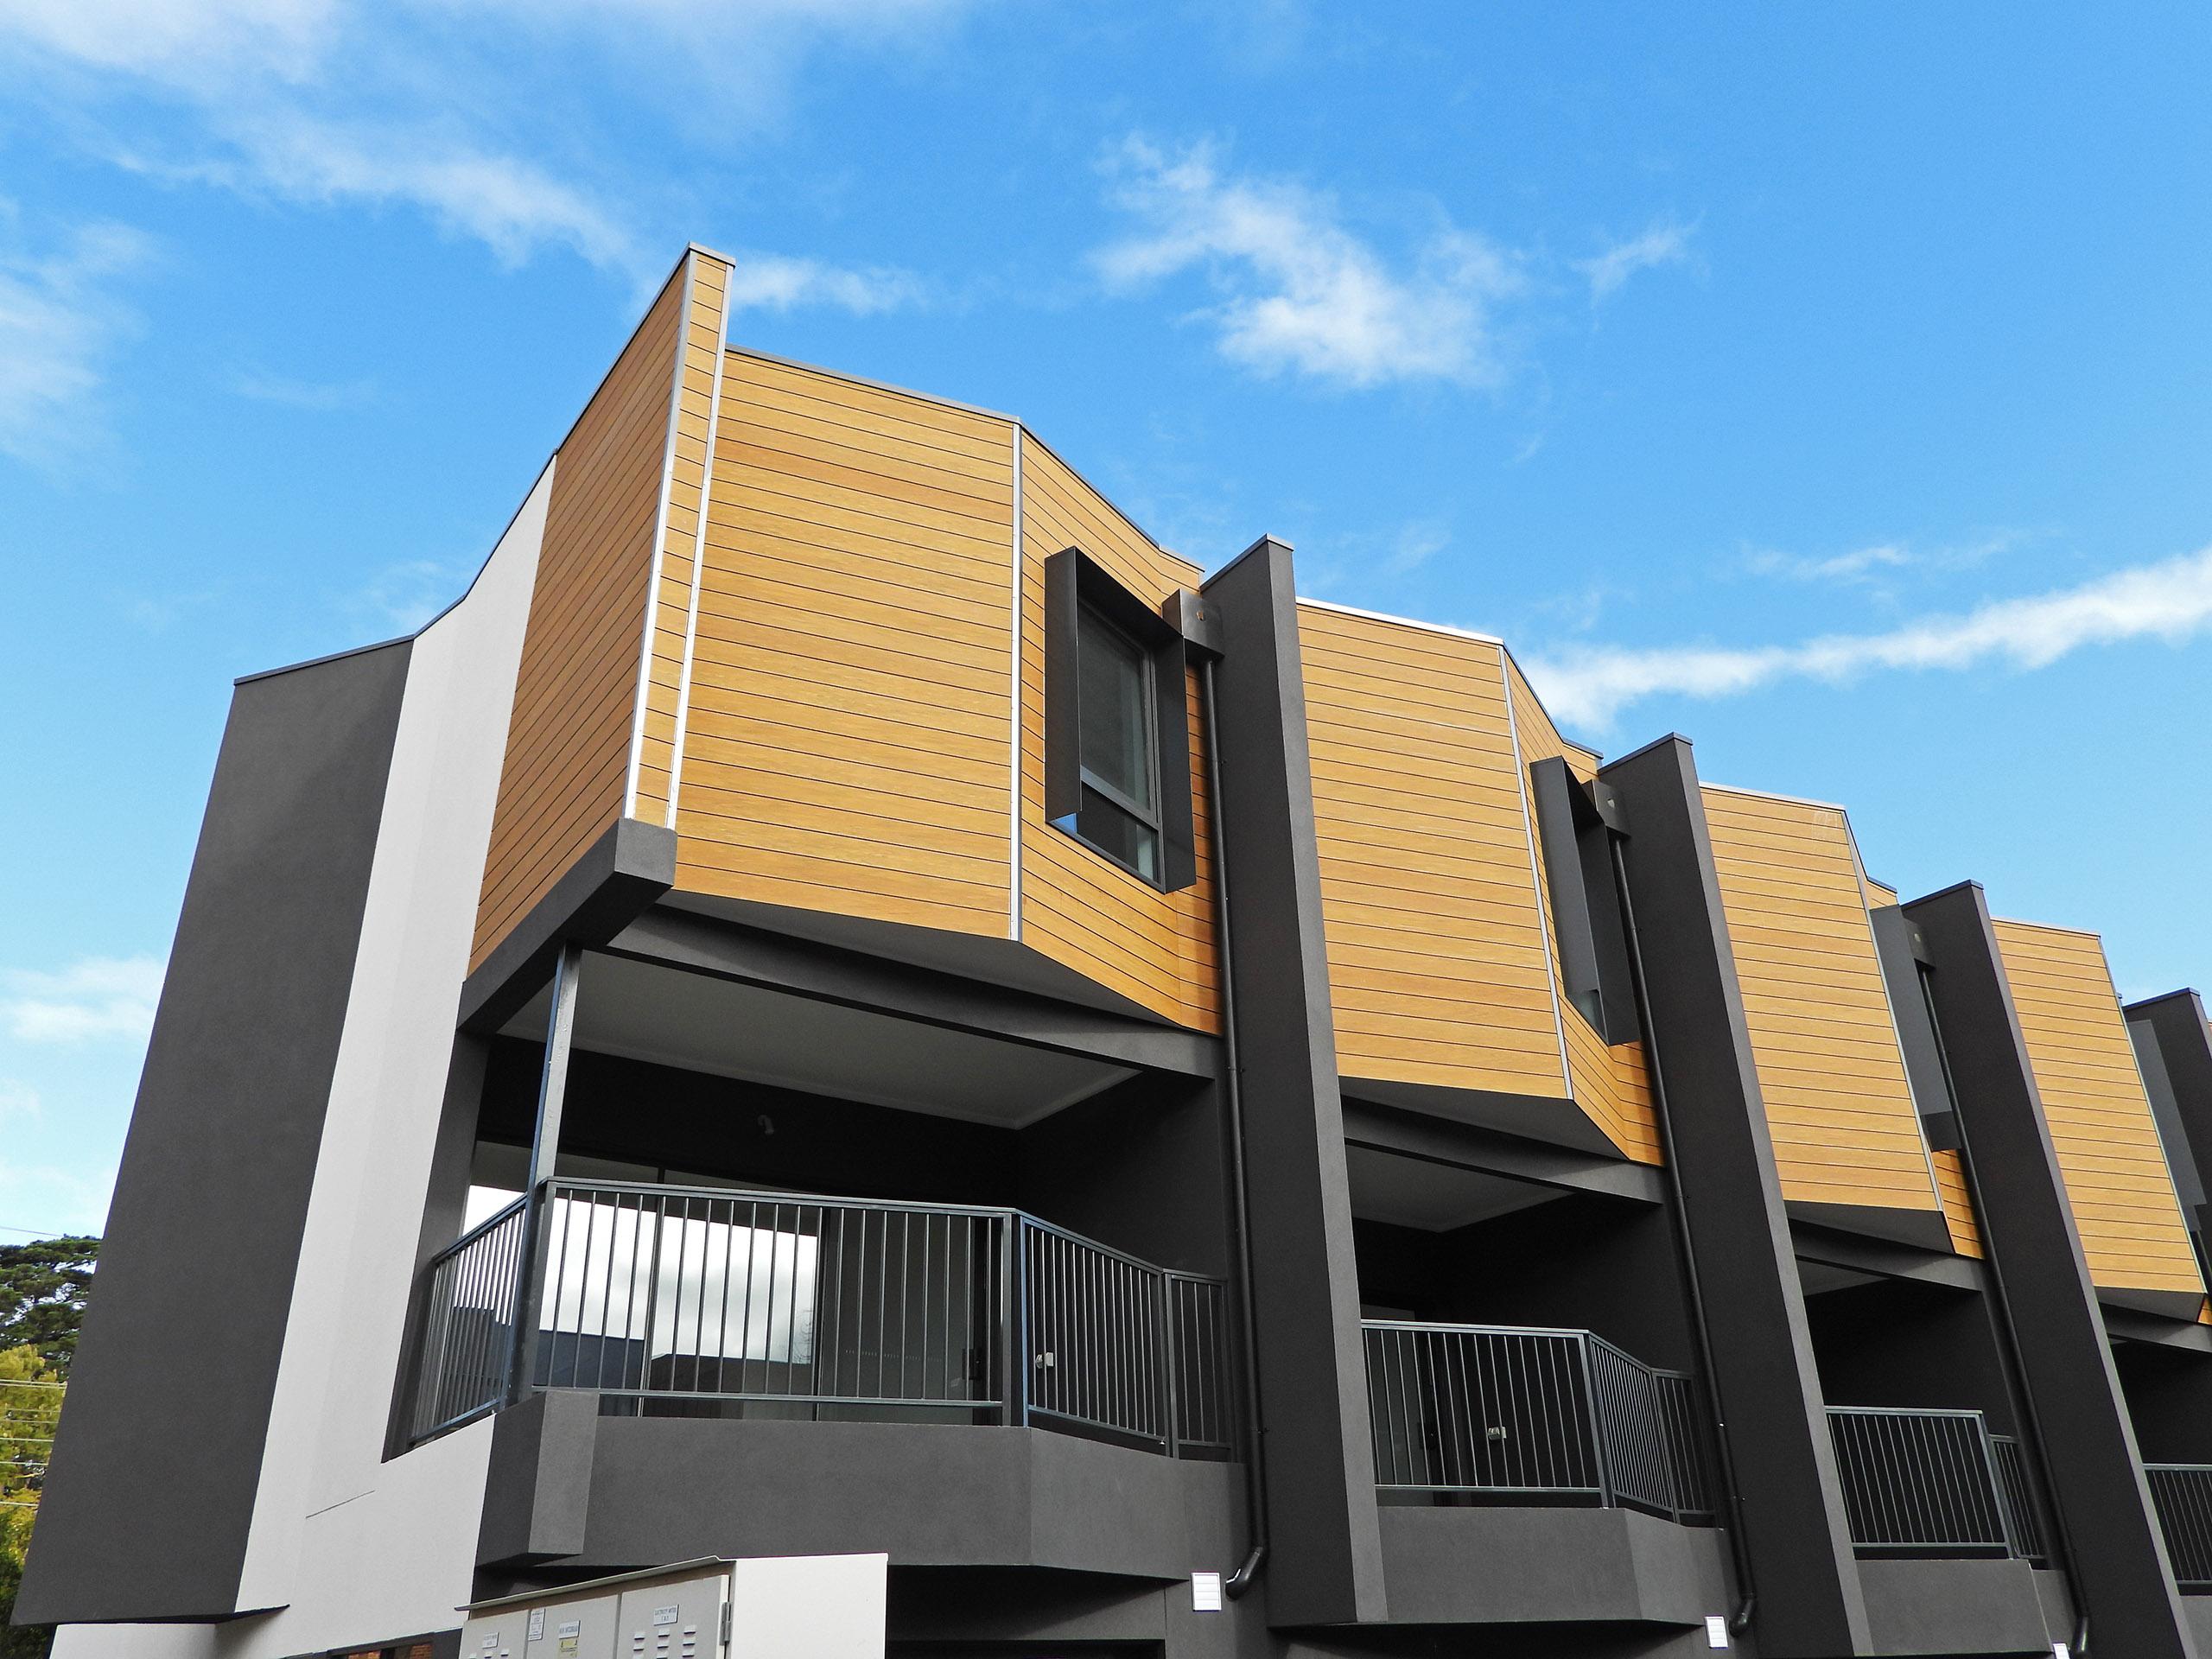 Pascoe Vale Townhouse Development